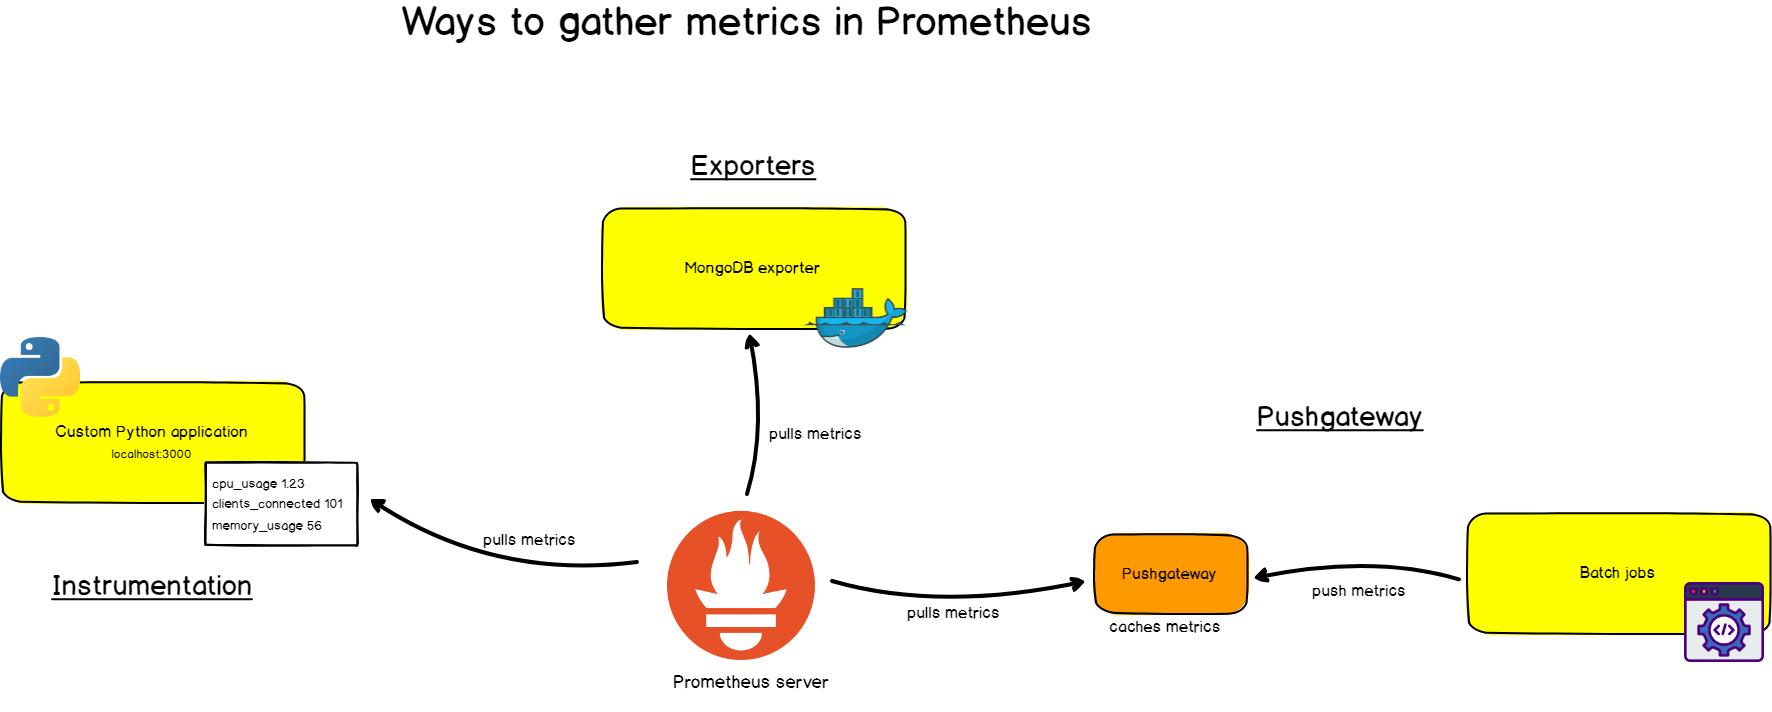 ways-gather-metrics